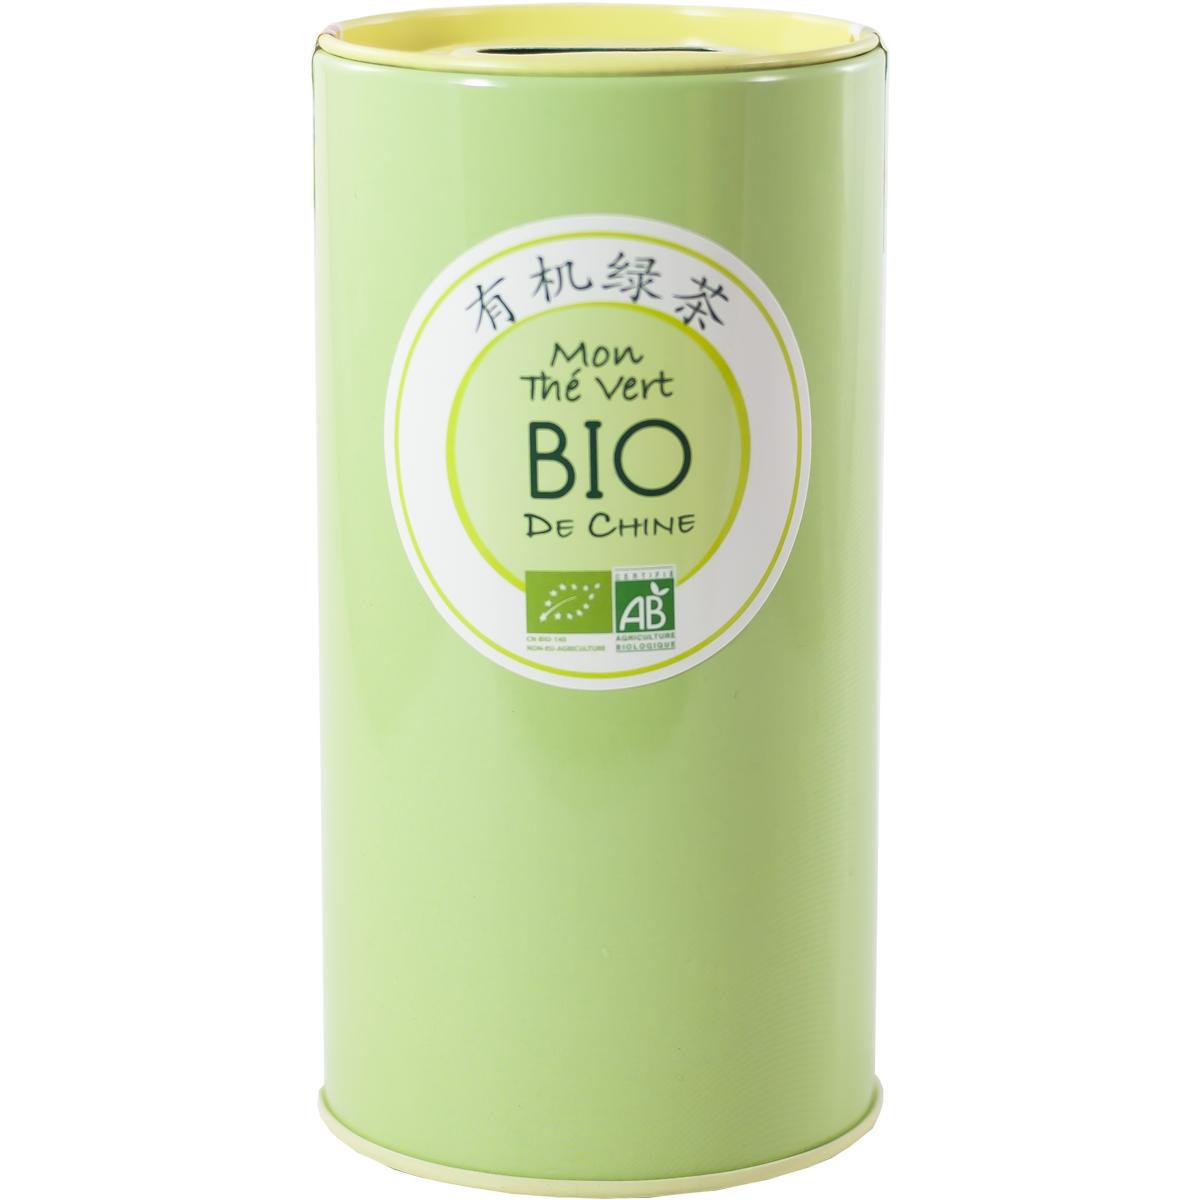 Mon thé vert BIO Image